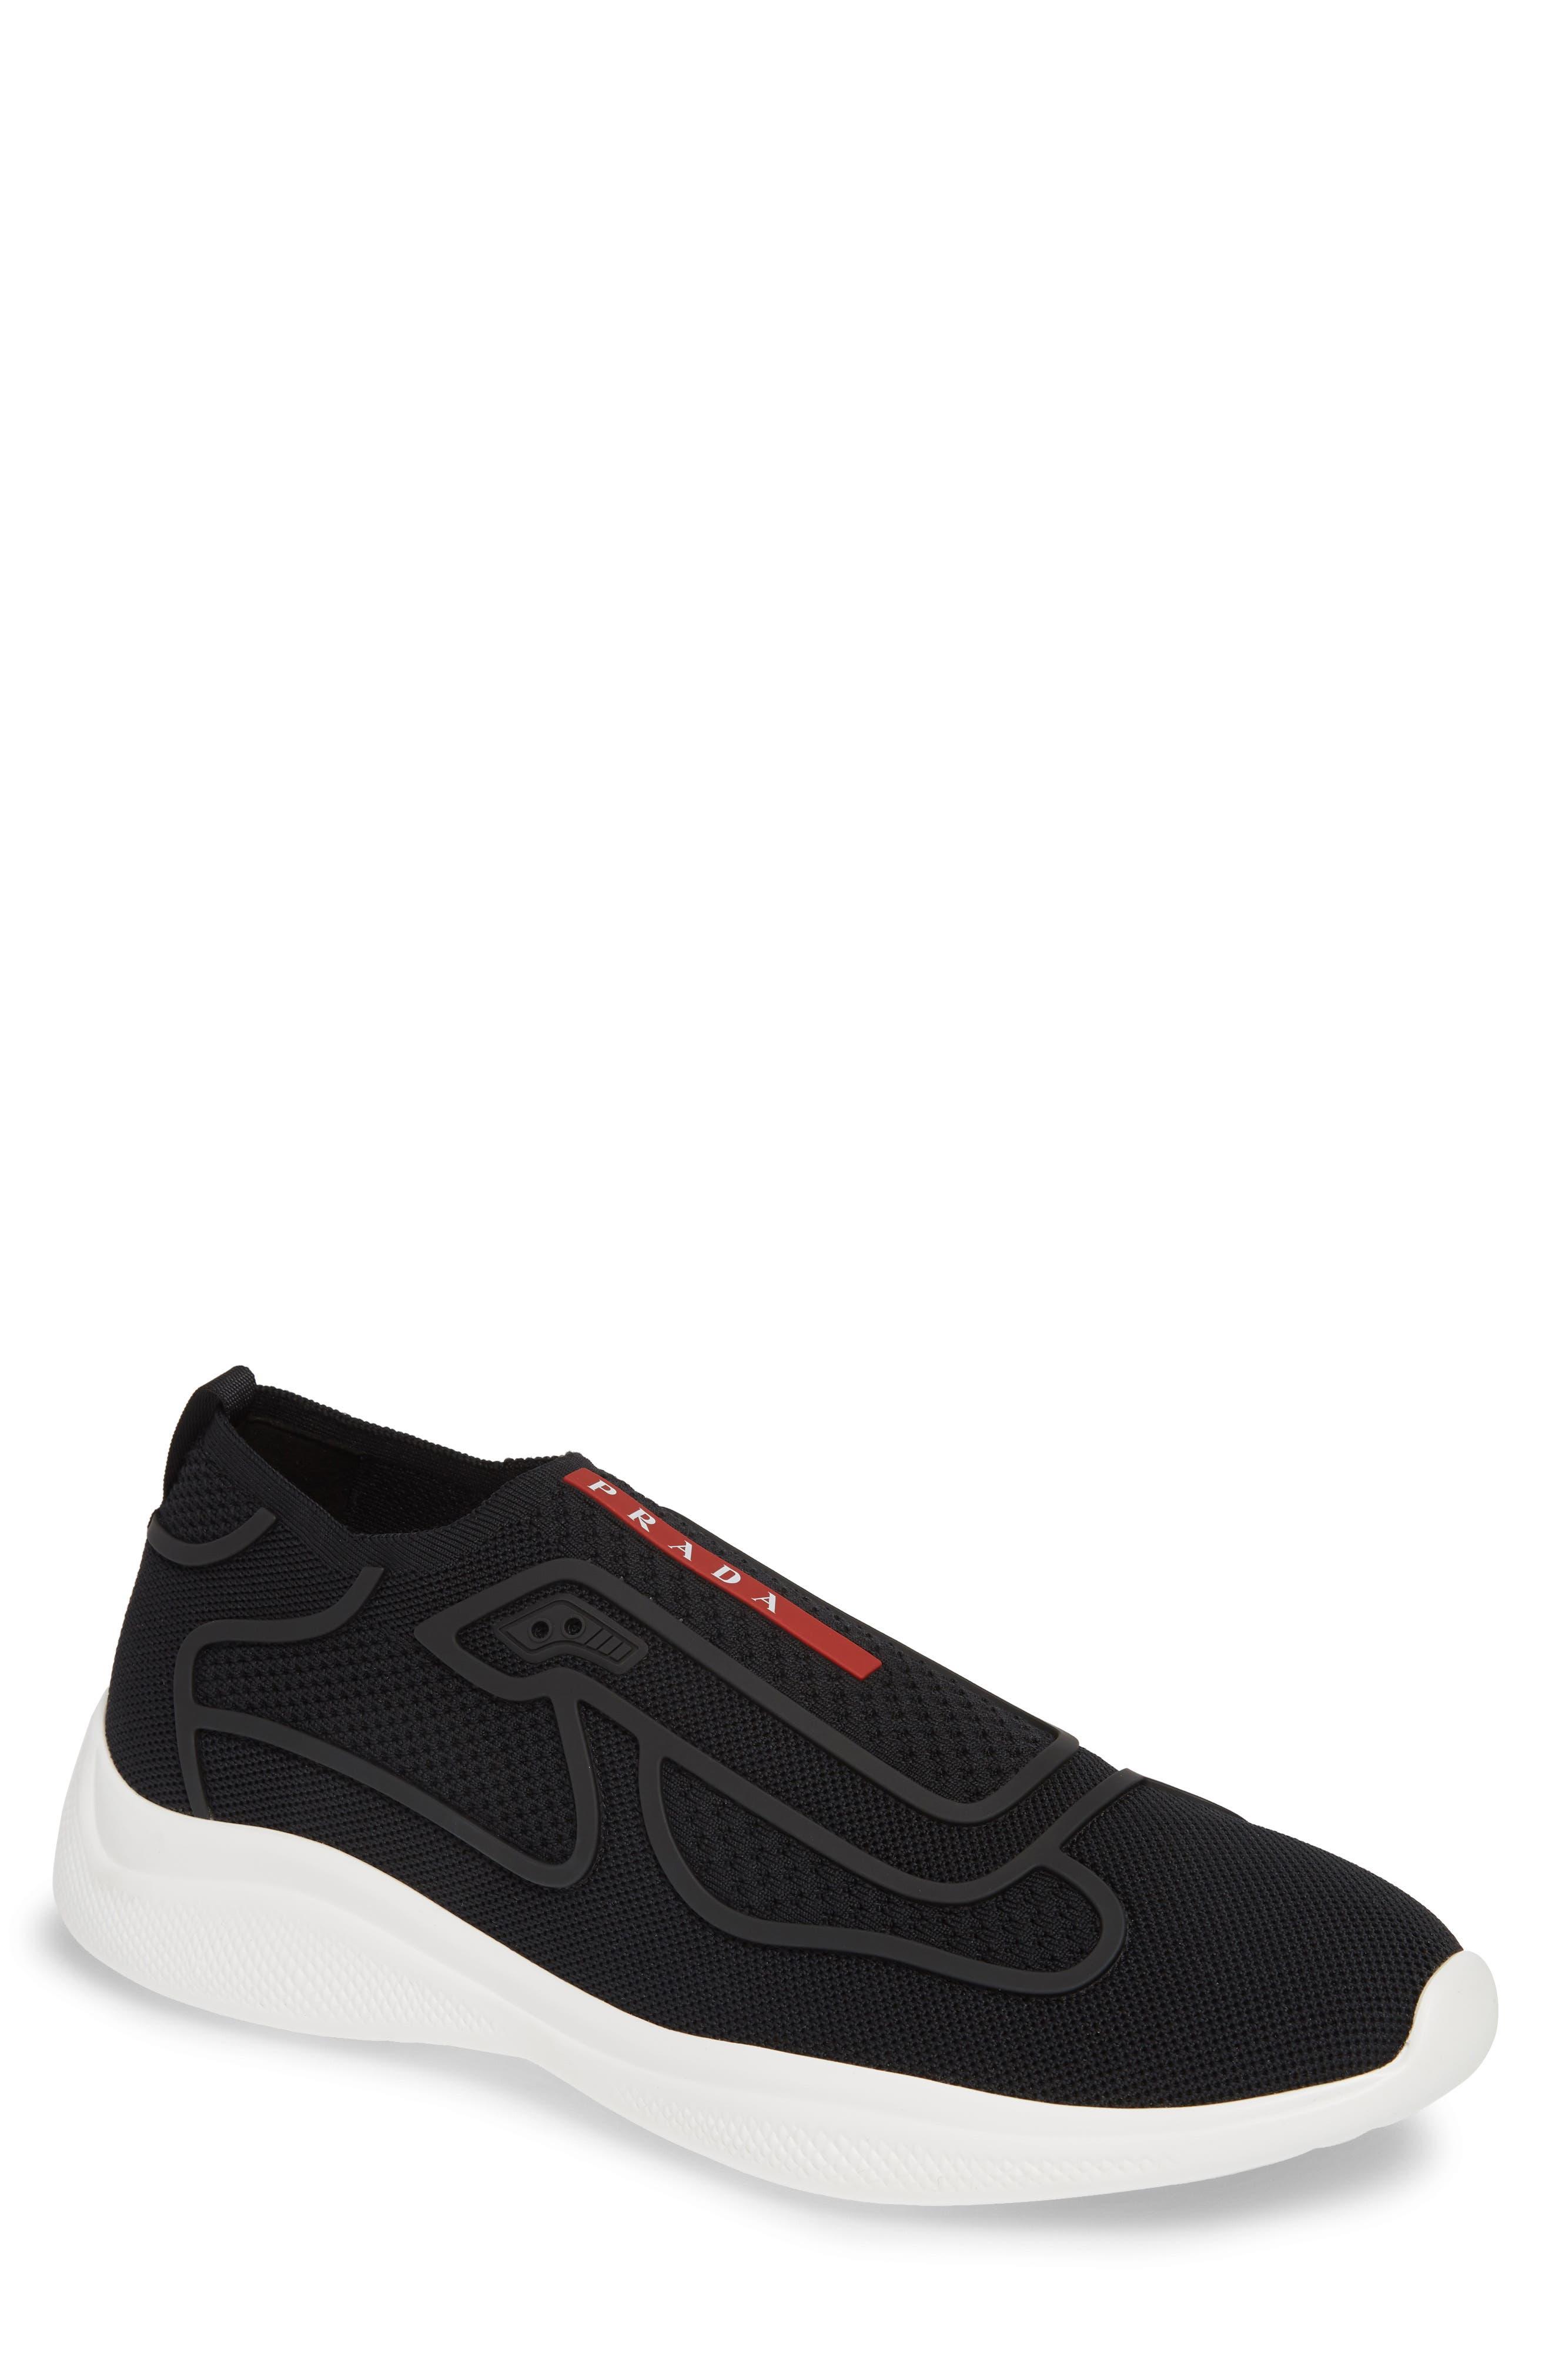 PRADA,                             Laceless Logo Sneaker,                             Main thumbnail 1, color,                             NERO